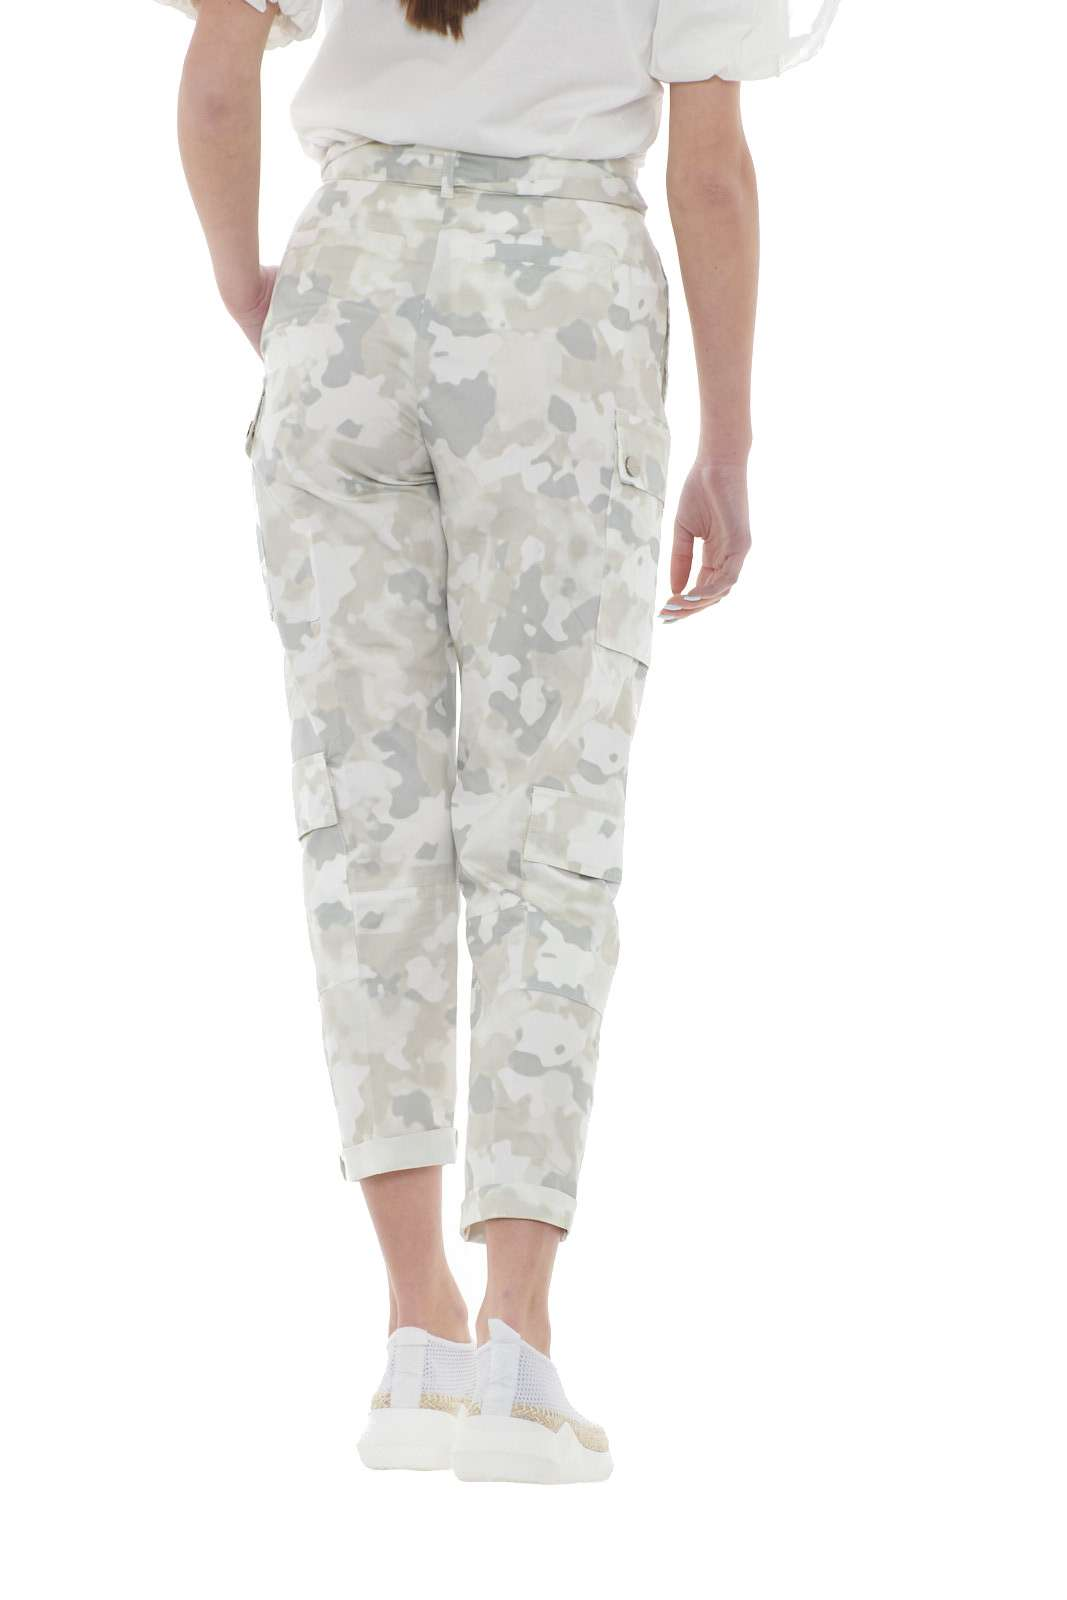 https://www.parmax.com/media/catalog/product/a/i/PE-outlet_parmax-pantaloni-donna-Pinko-1b14fn-C.jpg